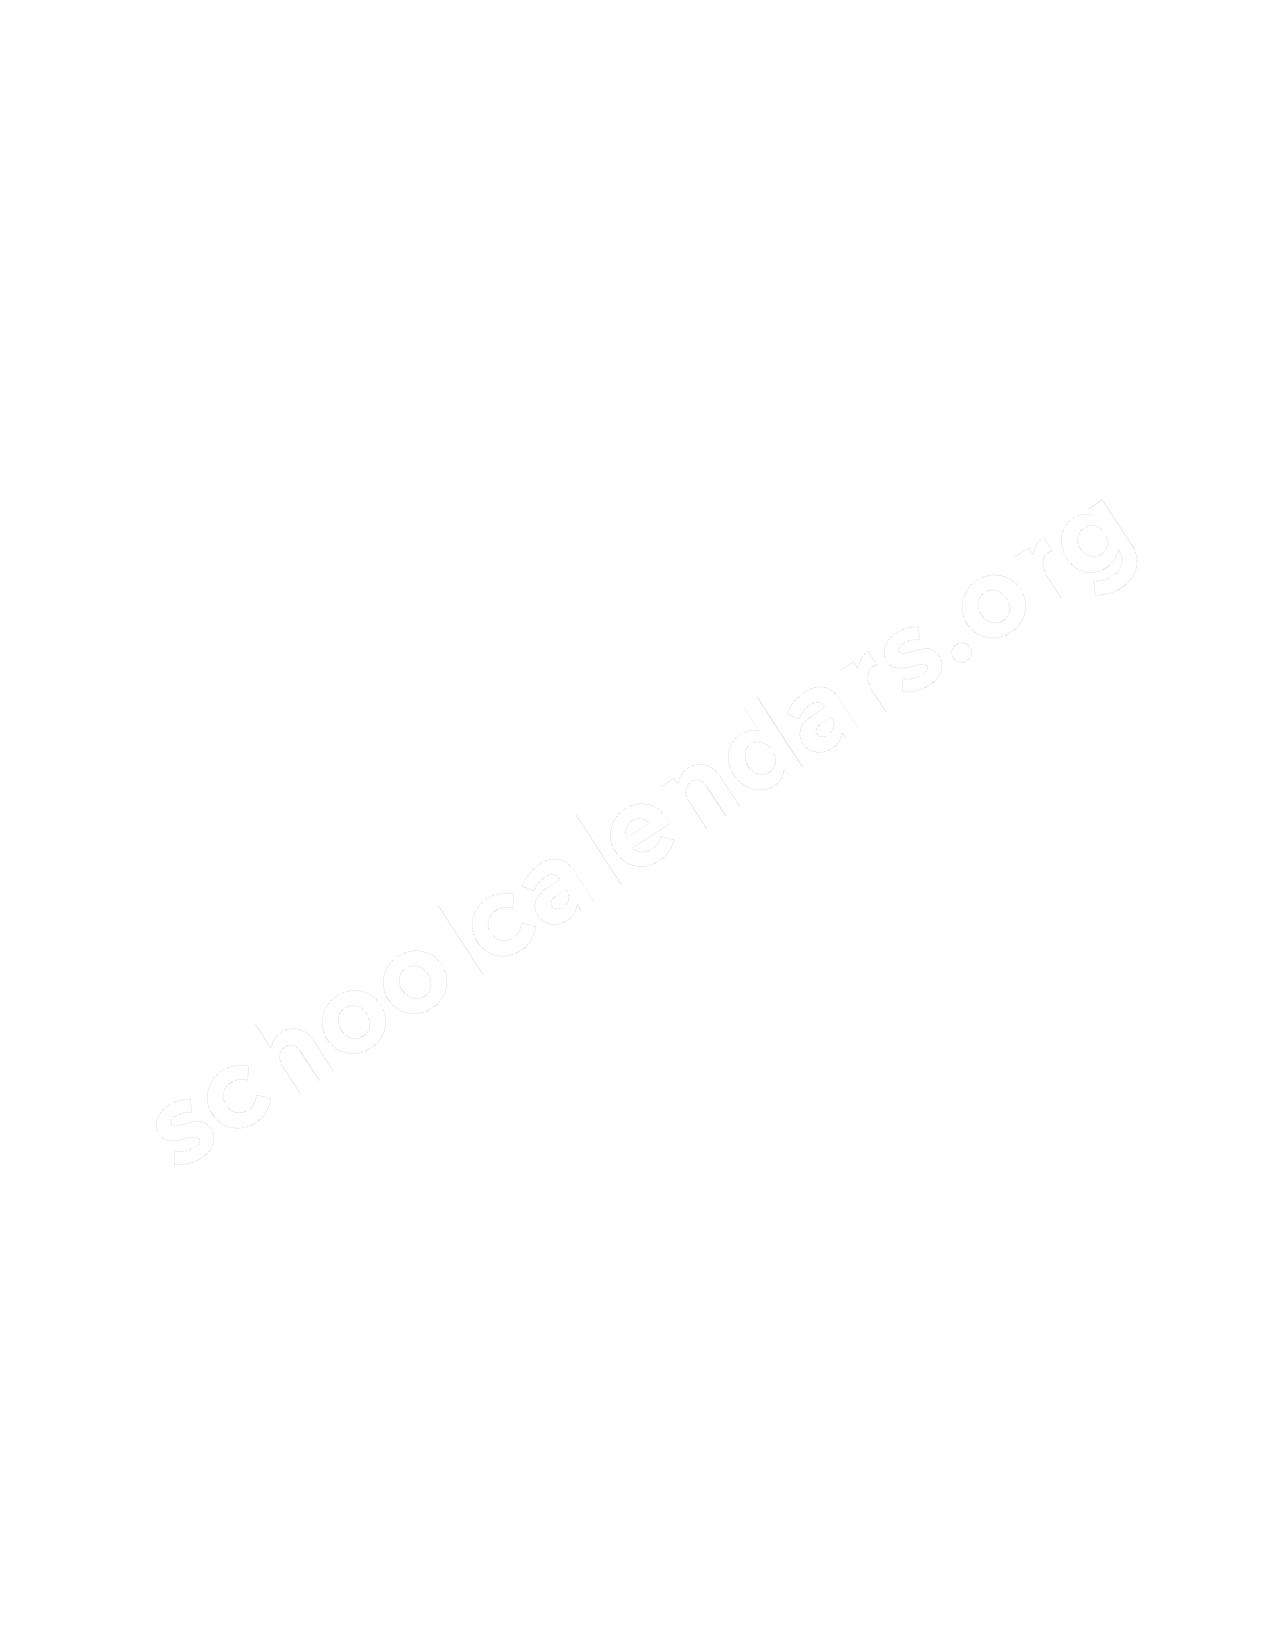 2016 - 2017 District Calendar – Houston High School – page 2